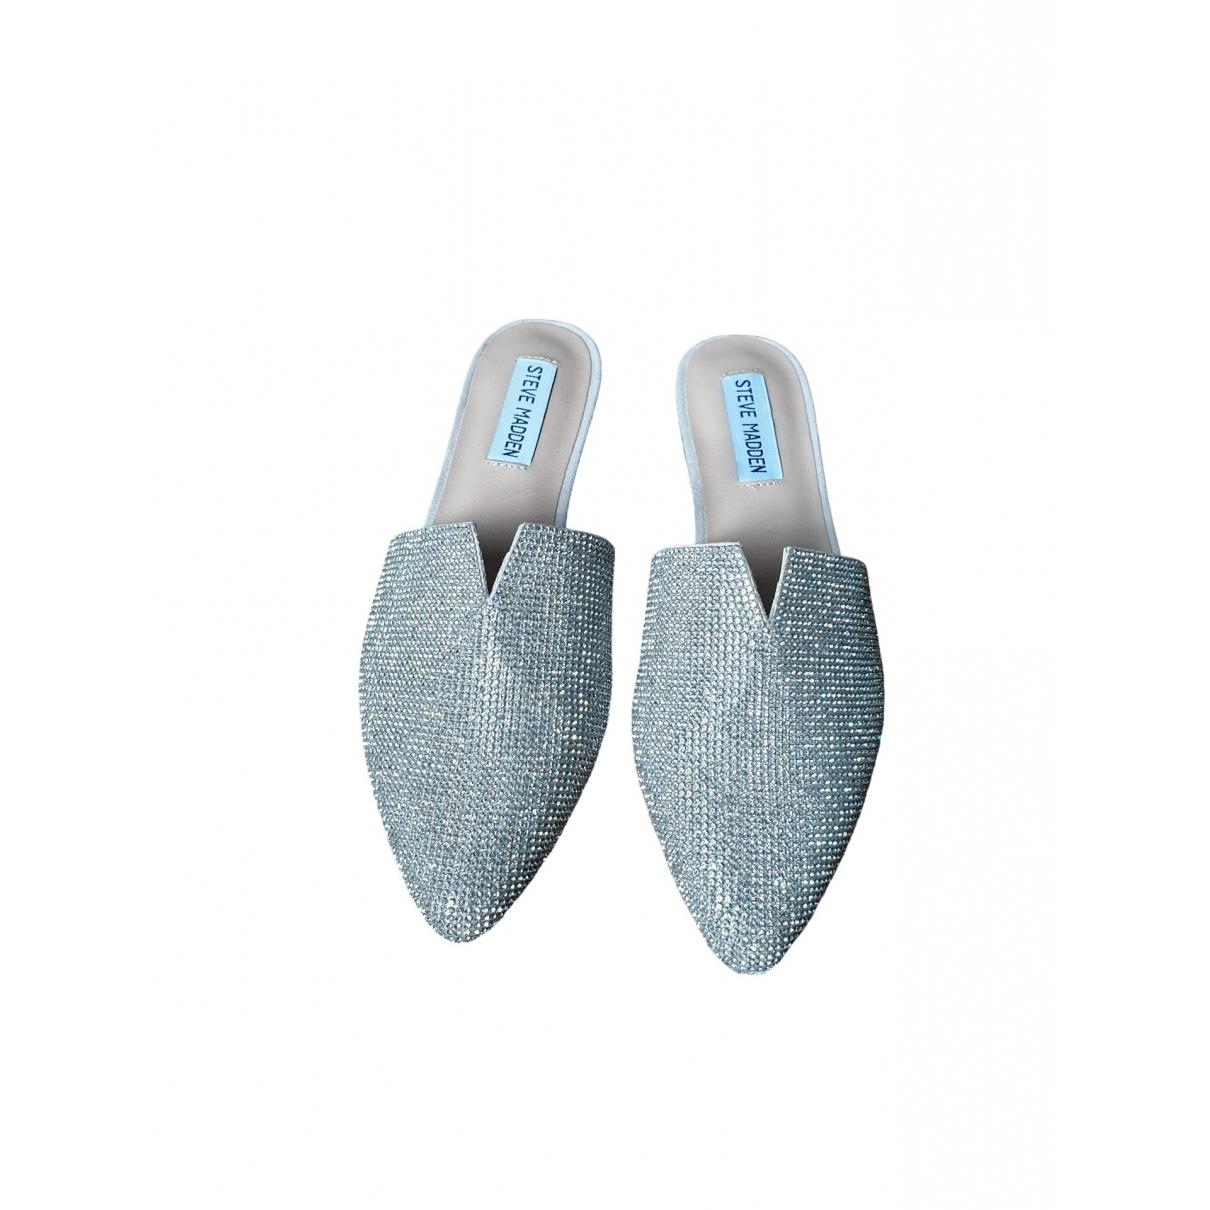 Steve Madden \N Beige Leather Flats for Women 7 US